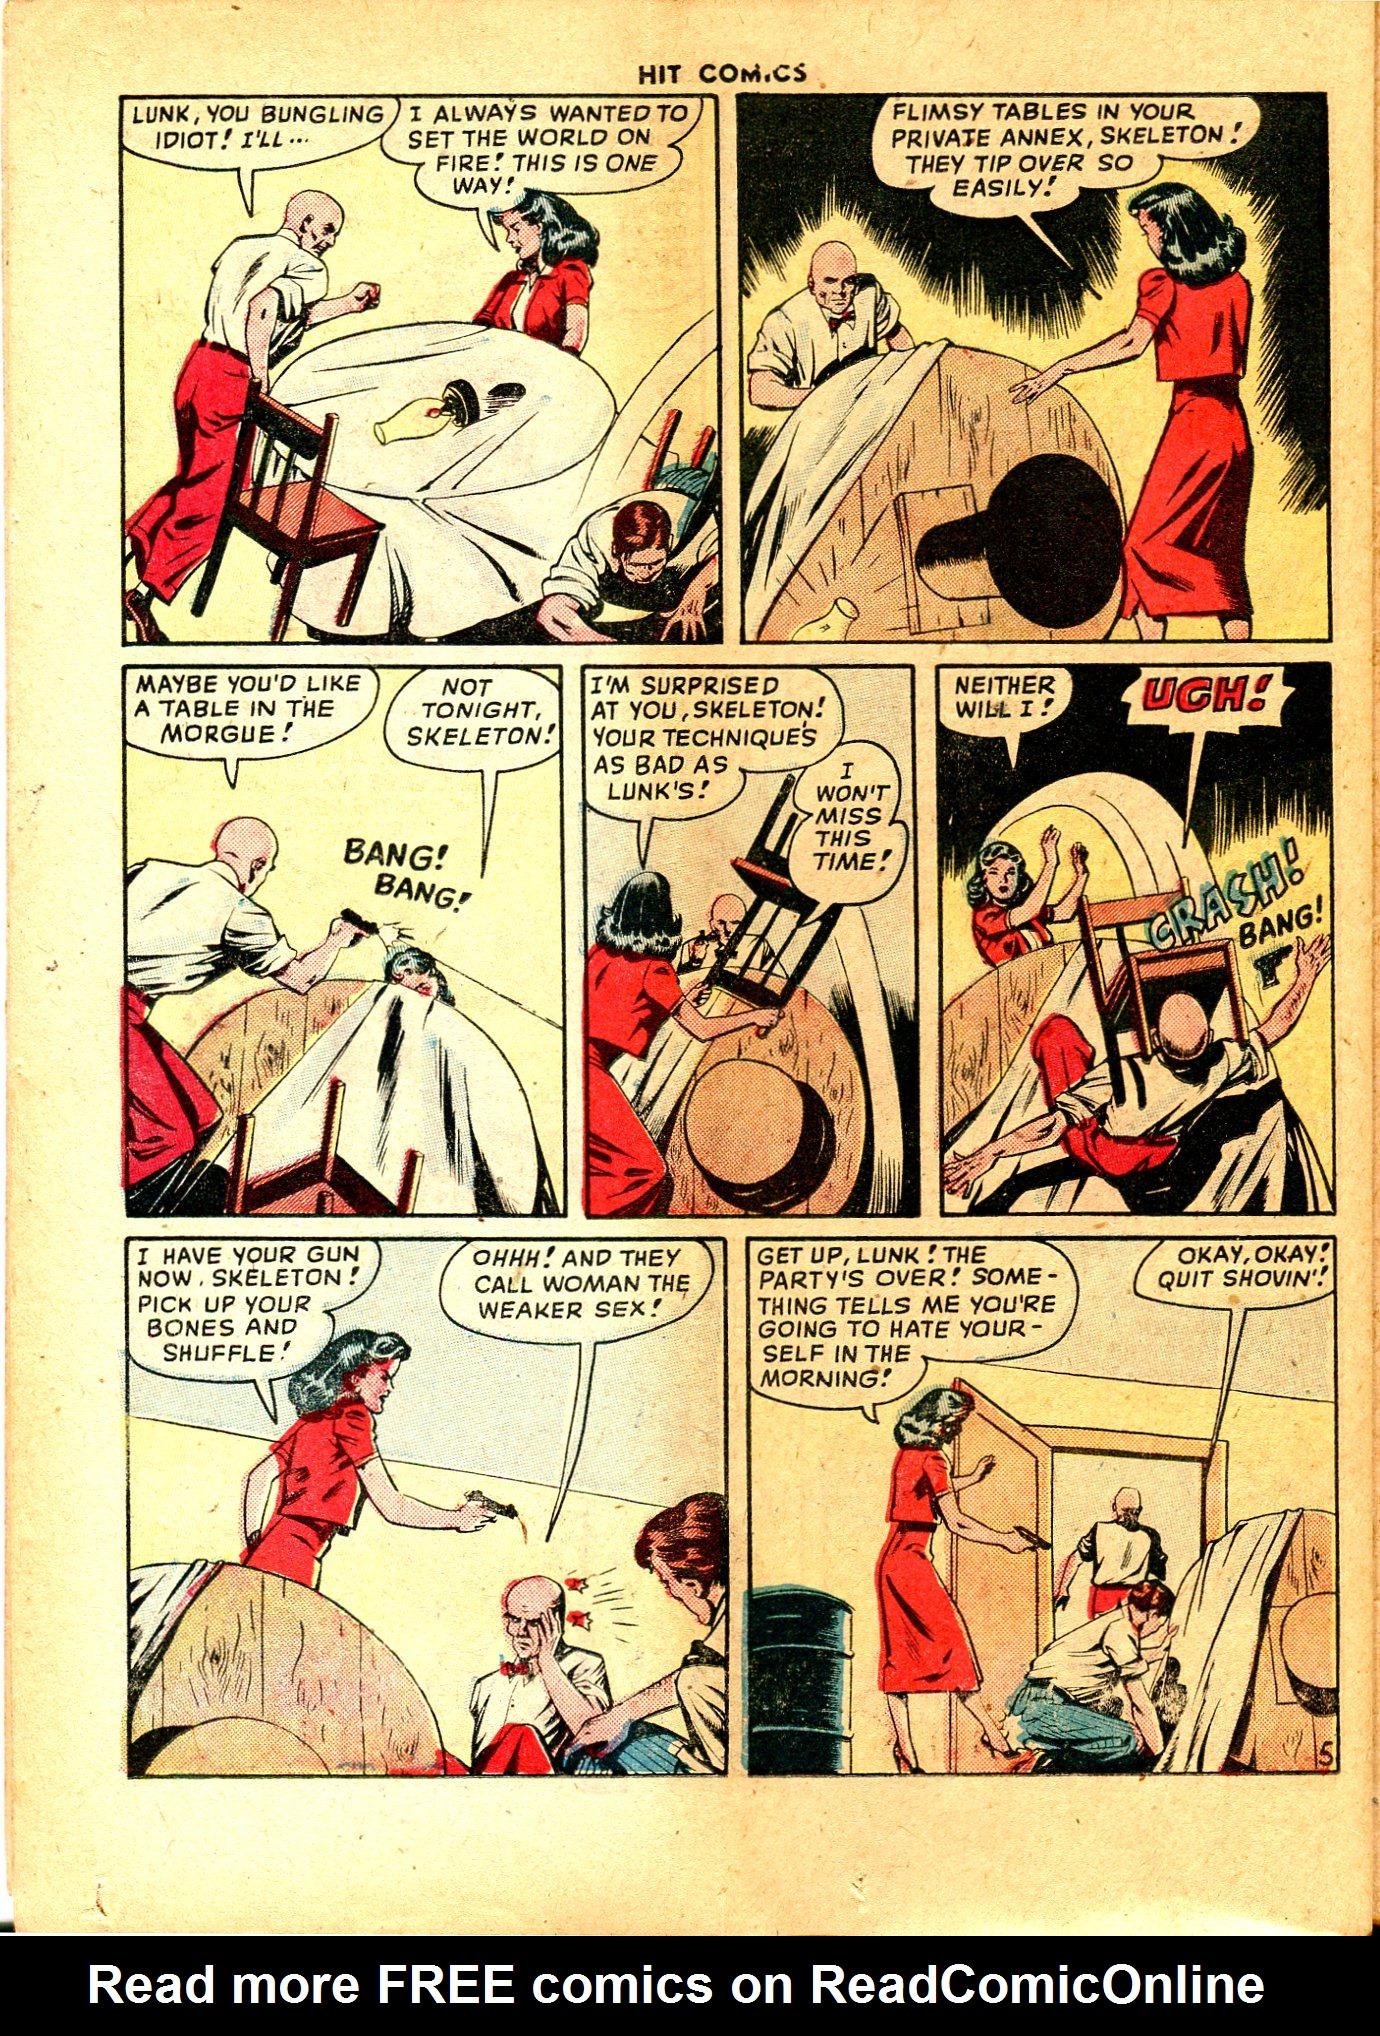 Read online Hit Comics comic -  Issue #57 - 36